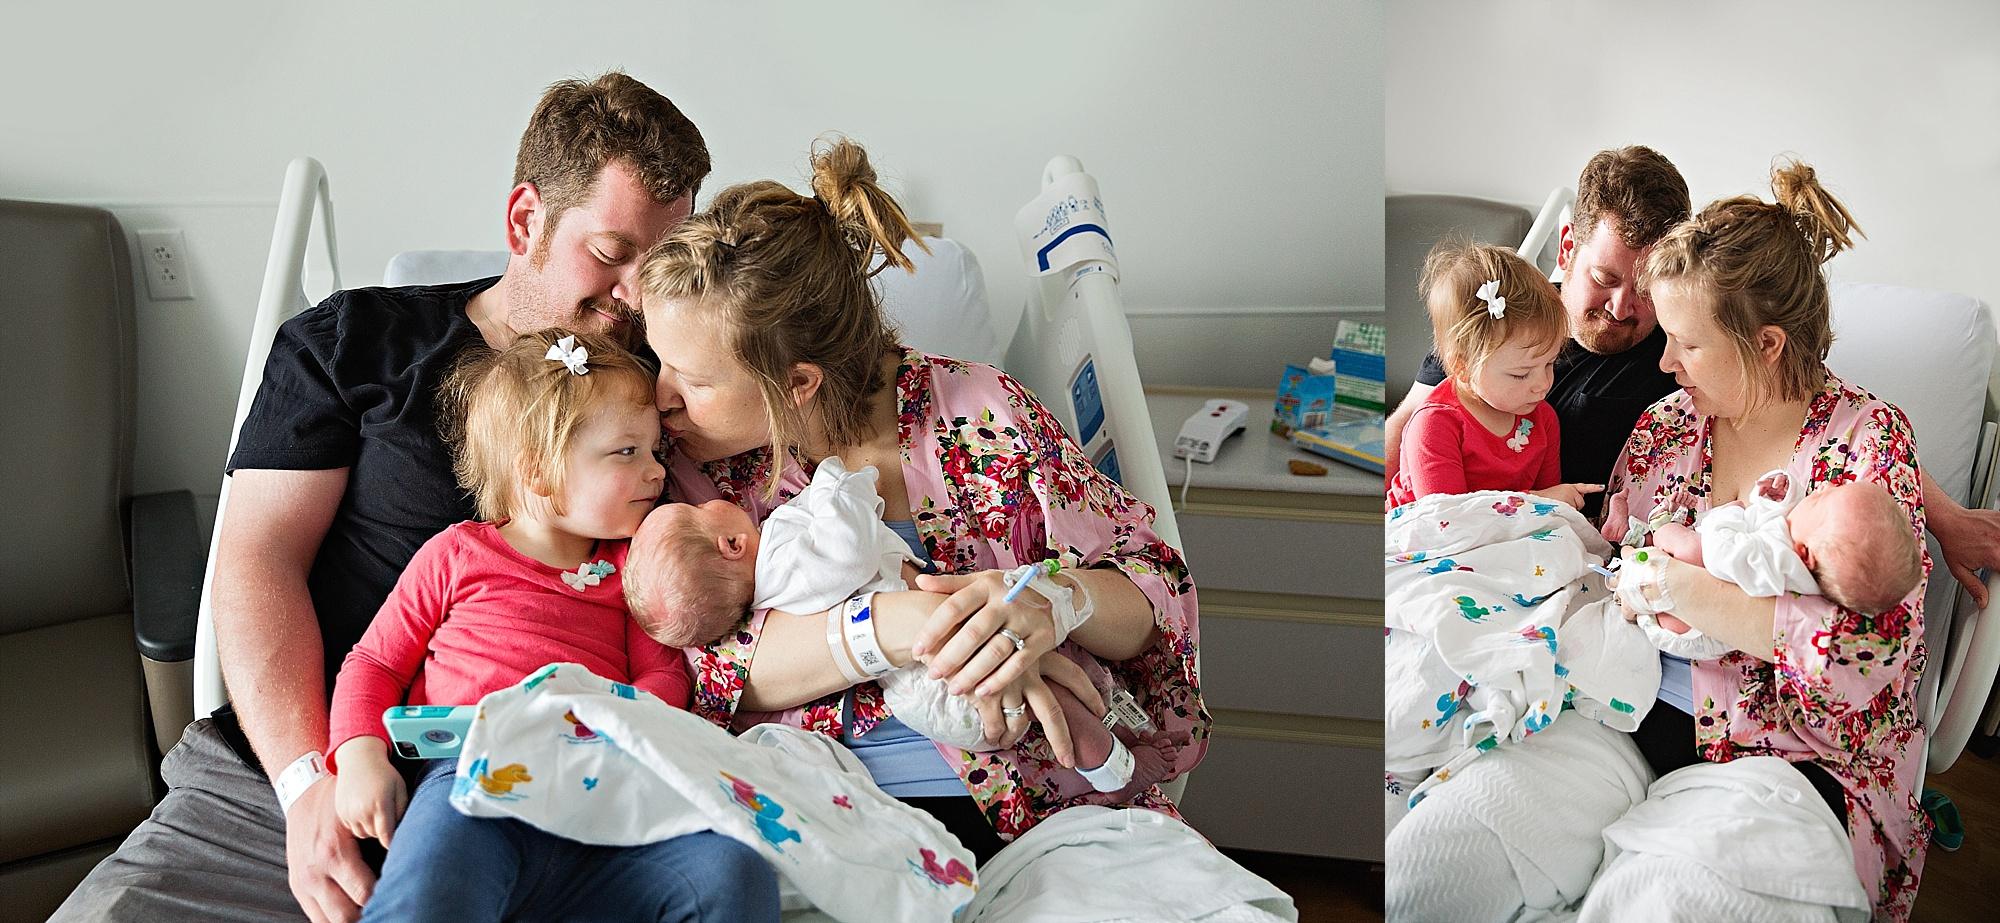 lauren-grayson-photography-akron-ohio-photographer-family-newborn-fresh-48-baby-hospital-photo-shoot-cleveland-clinic-akron-general-carter_0329.jpg